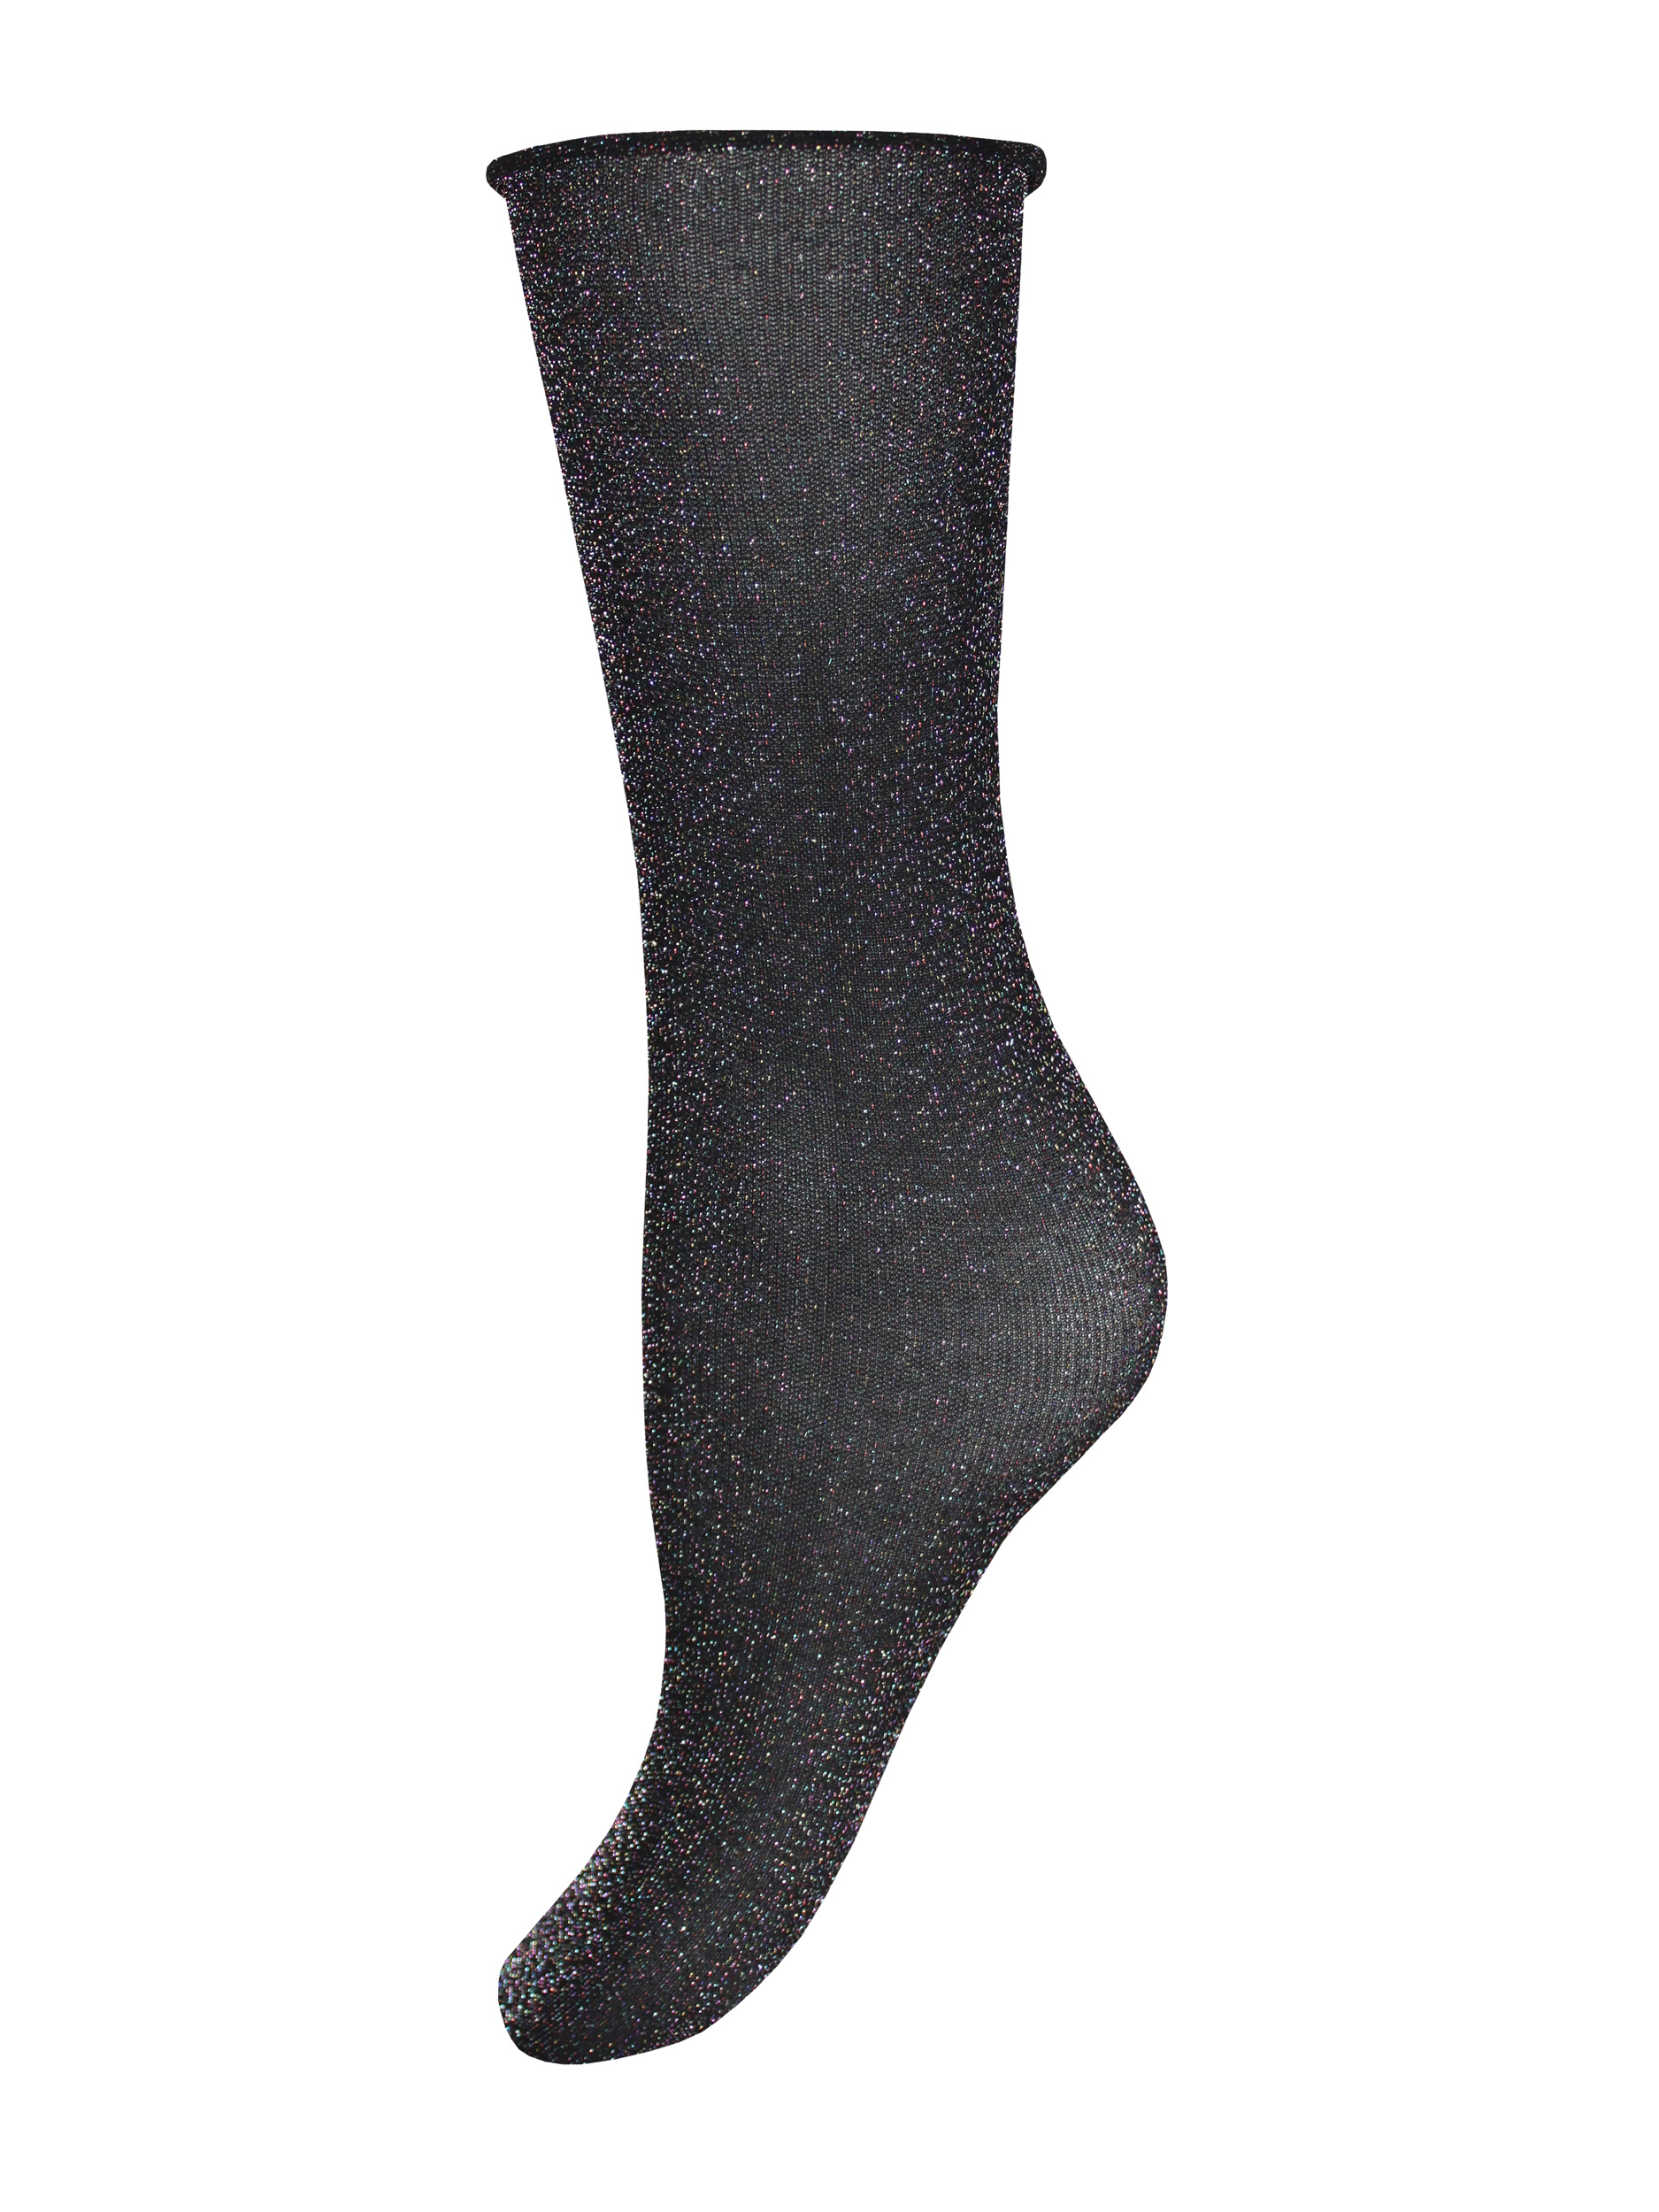 Капроновые носки женские Mademoiselle Vela (c.) UNI multicolor